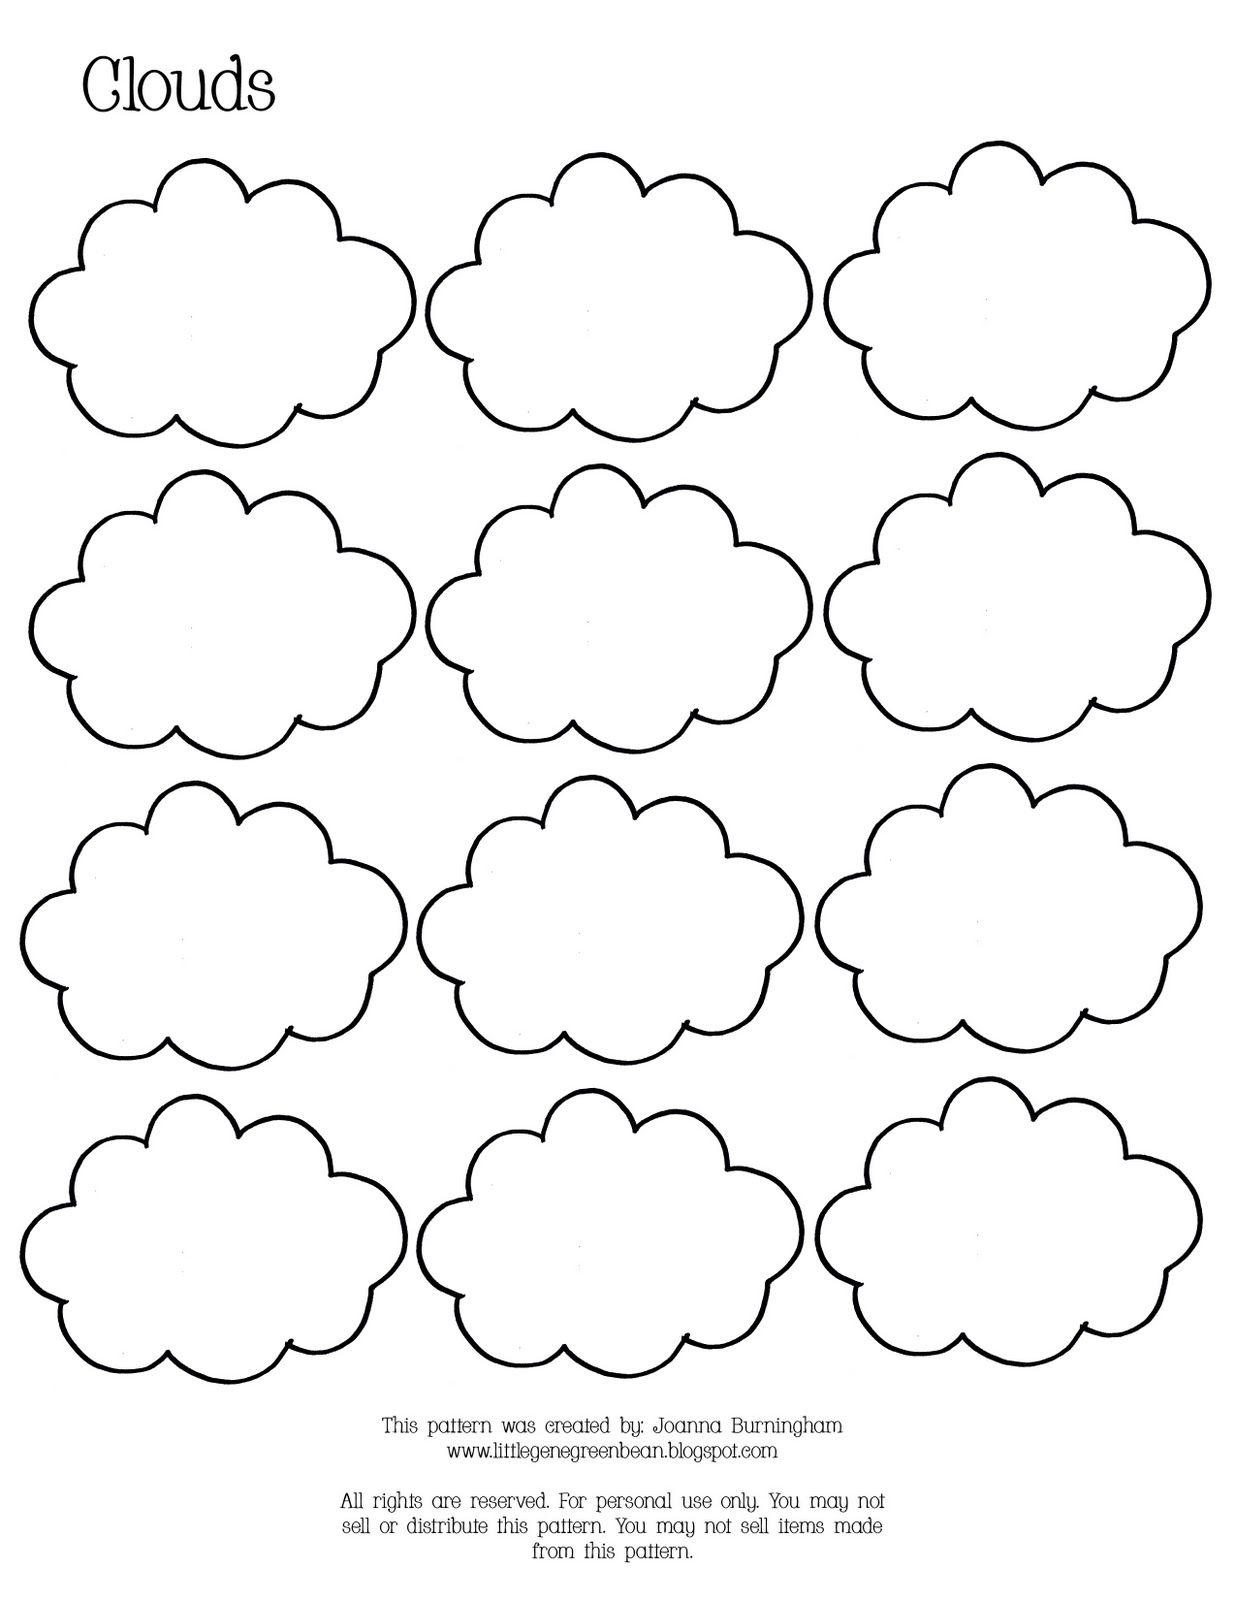 Kinds of Clouds: Quiz & Worksheet for Kids | Study.com